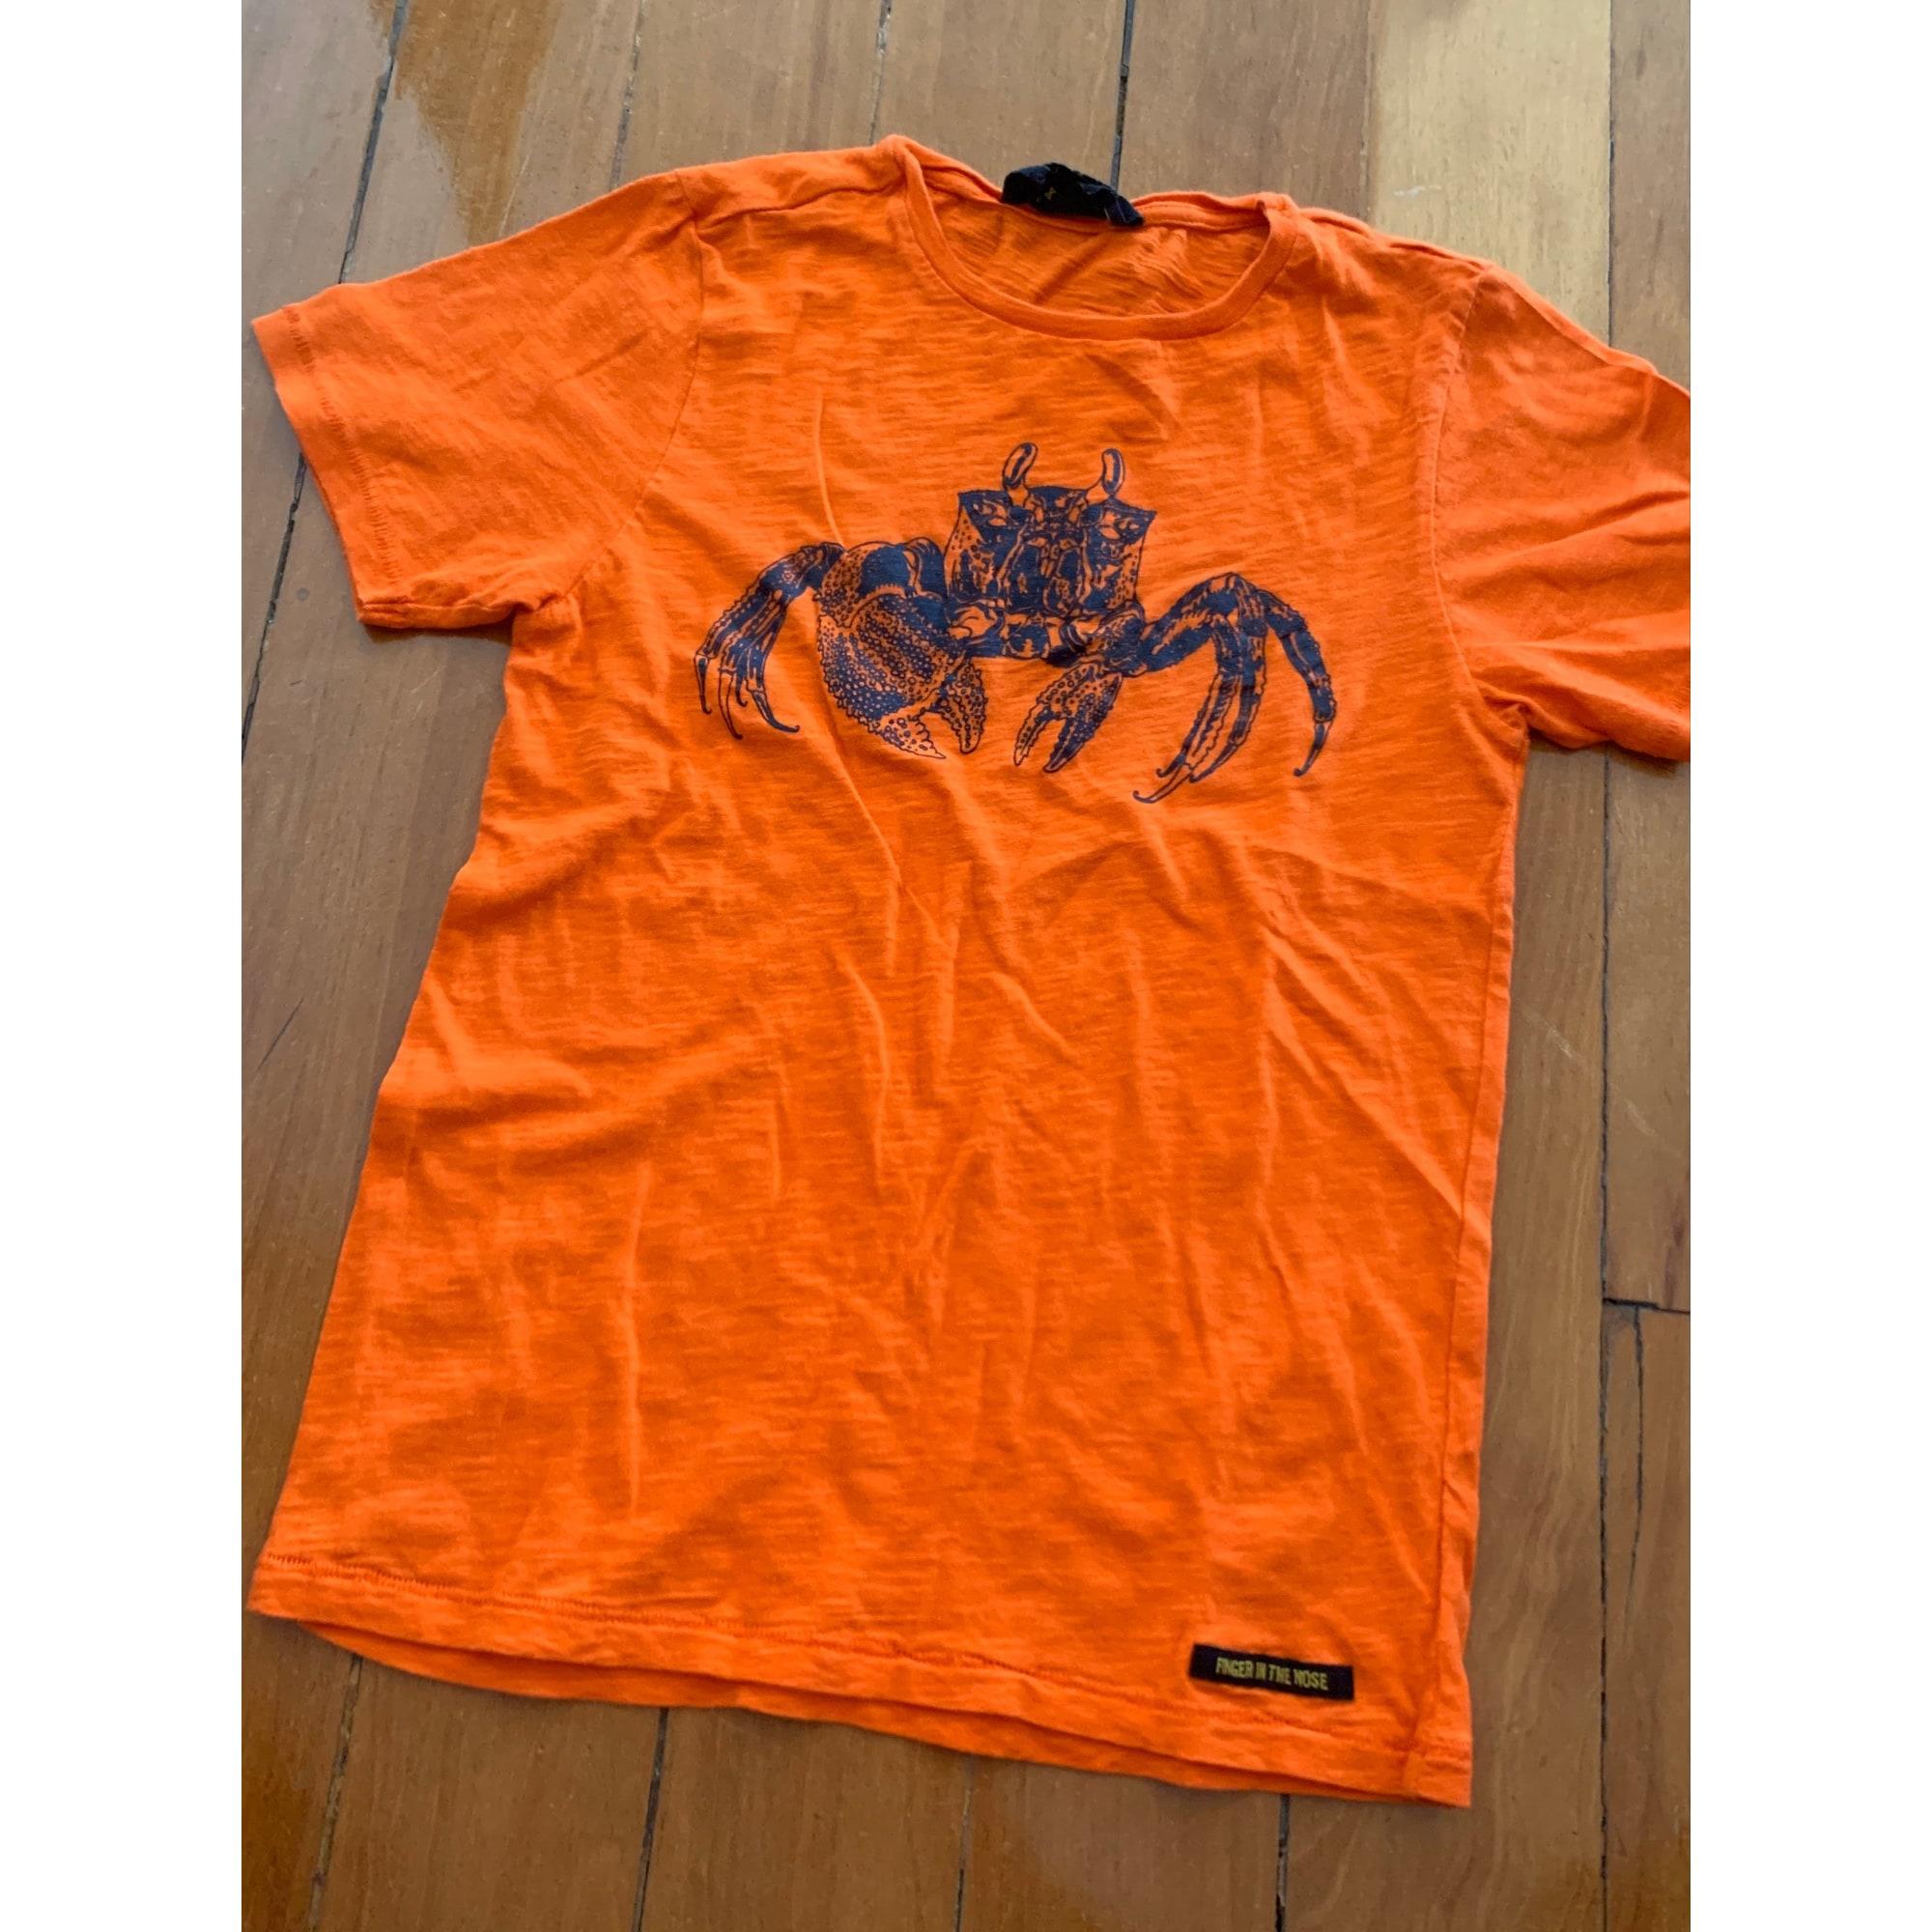 Tee-shirt FINGER IN THE NOSE Orange